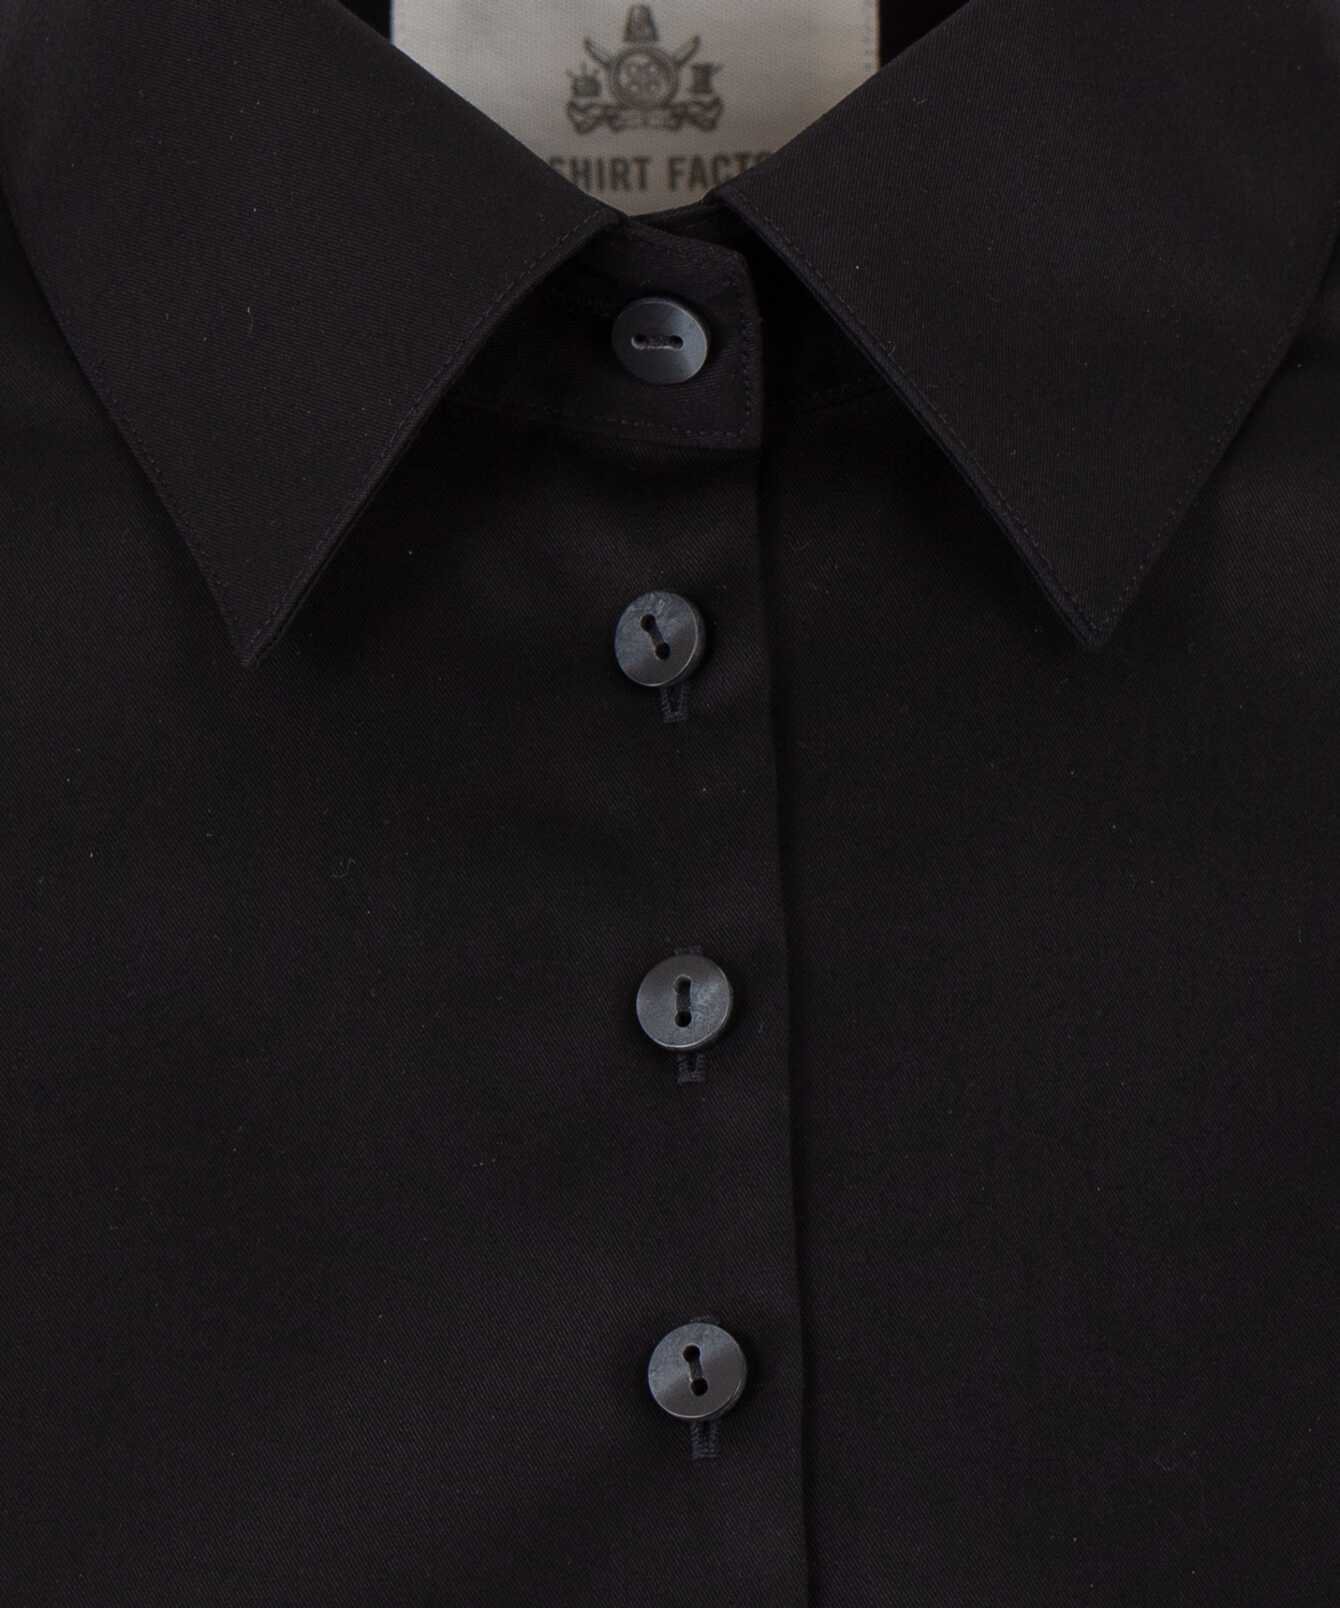 Skjorta Moa Grand Twill Strykfri Svart The Shirt Factory